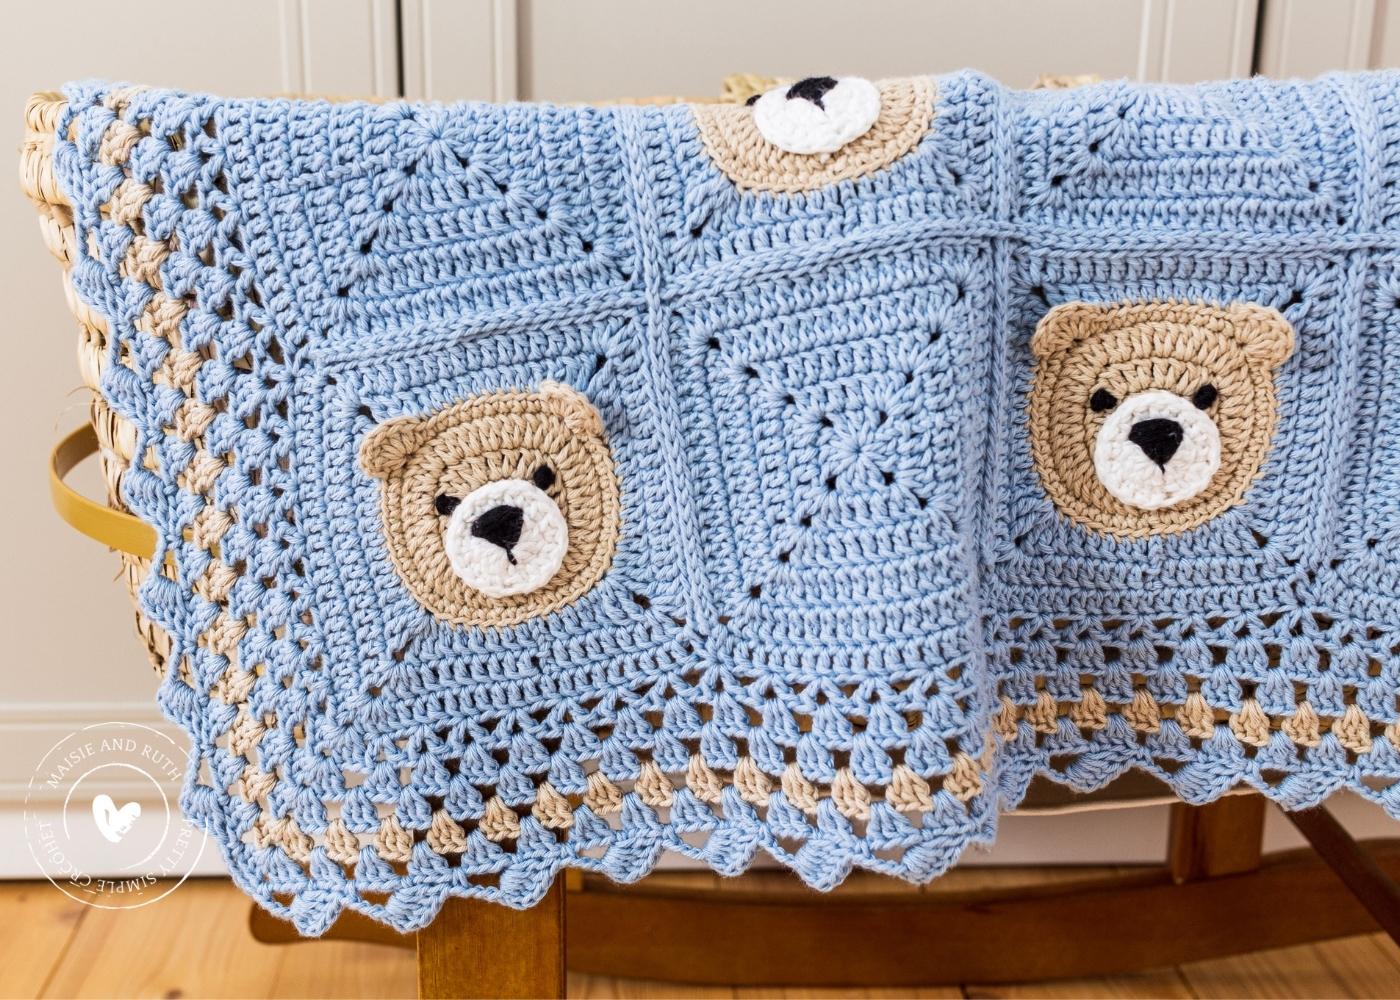 Bear Crochet Baby Blanket Close up of side of blanket